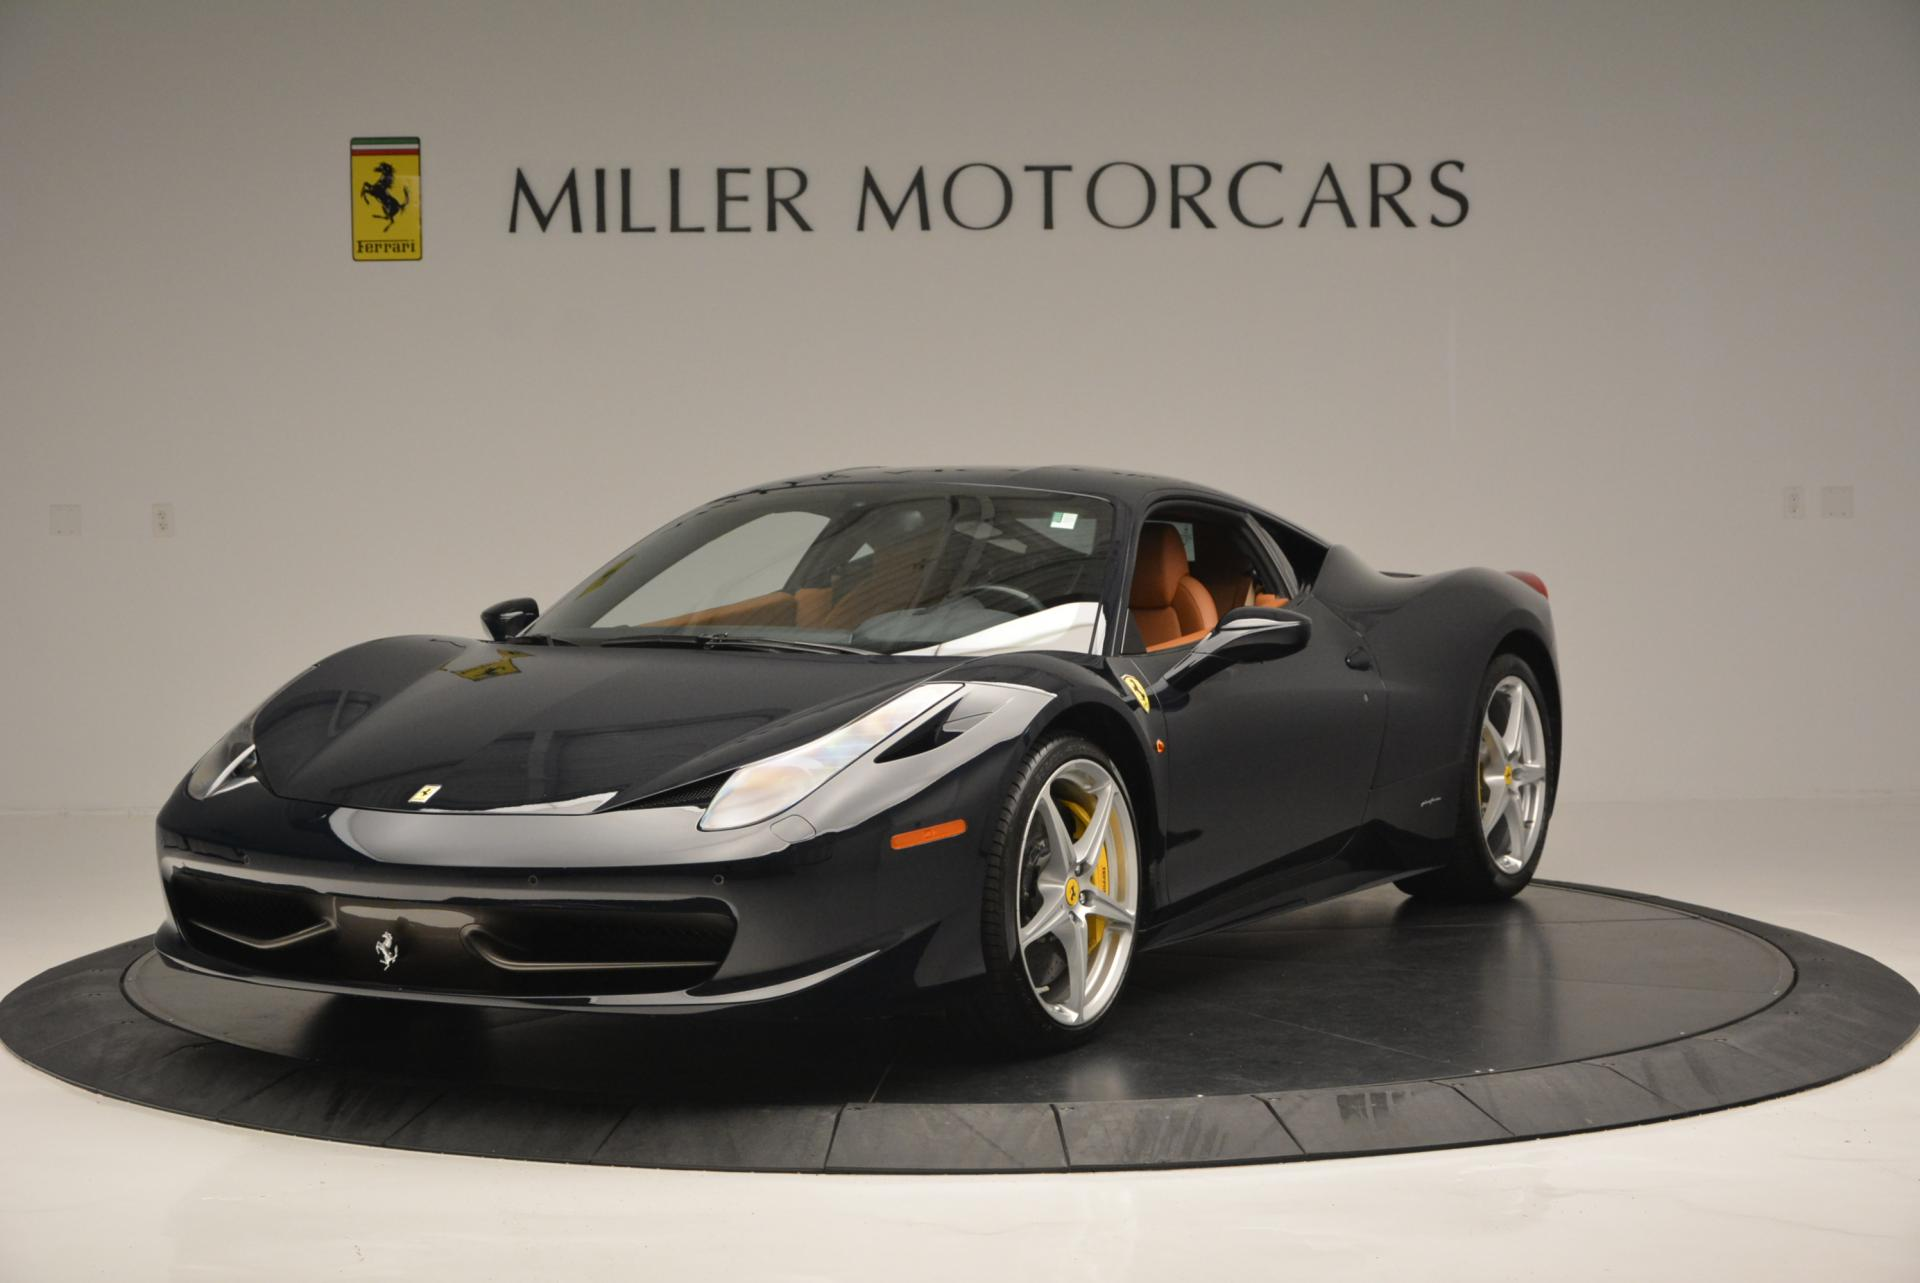 Used 2010 Ferrari 458 Italia for sale Sold at Rolls-Royce Motor Cars Greenwich in Greenwich CT 06830 1